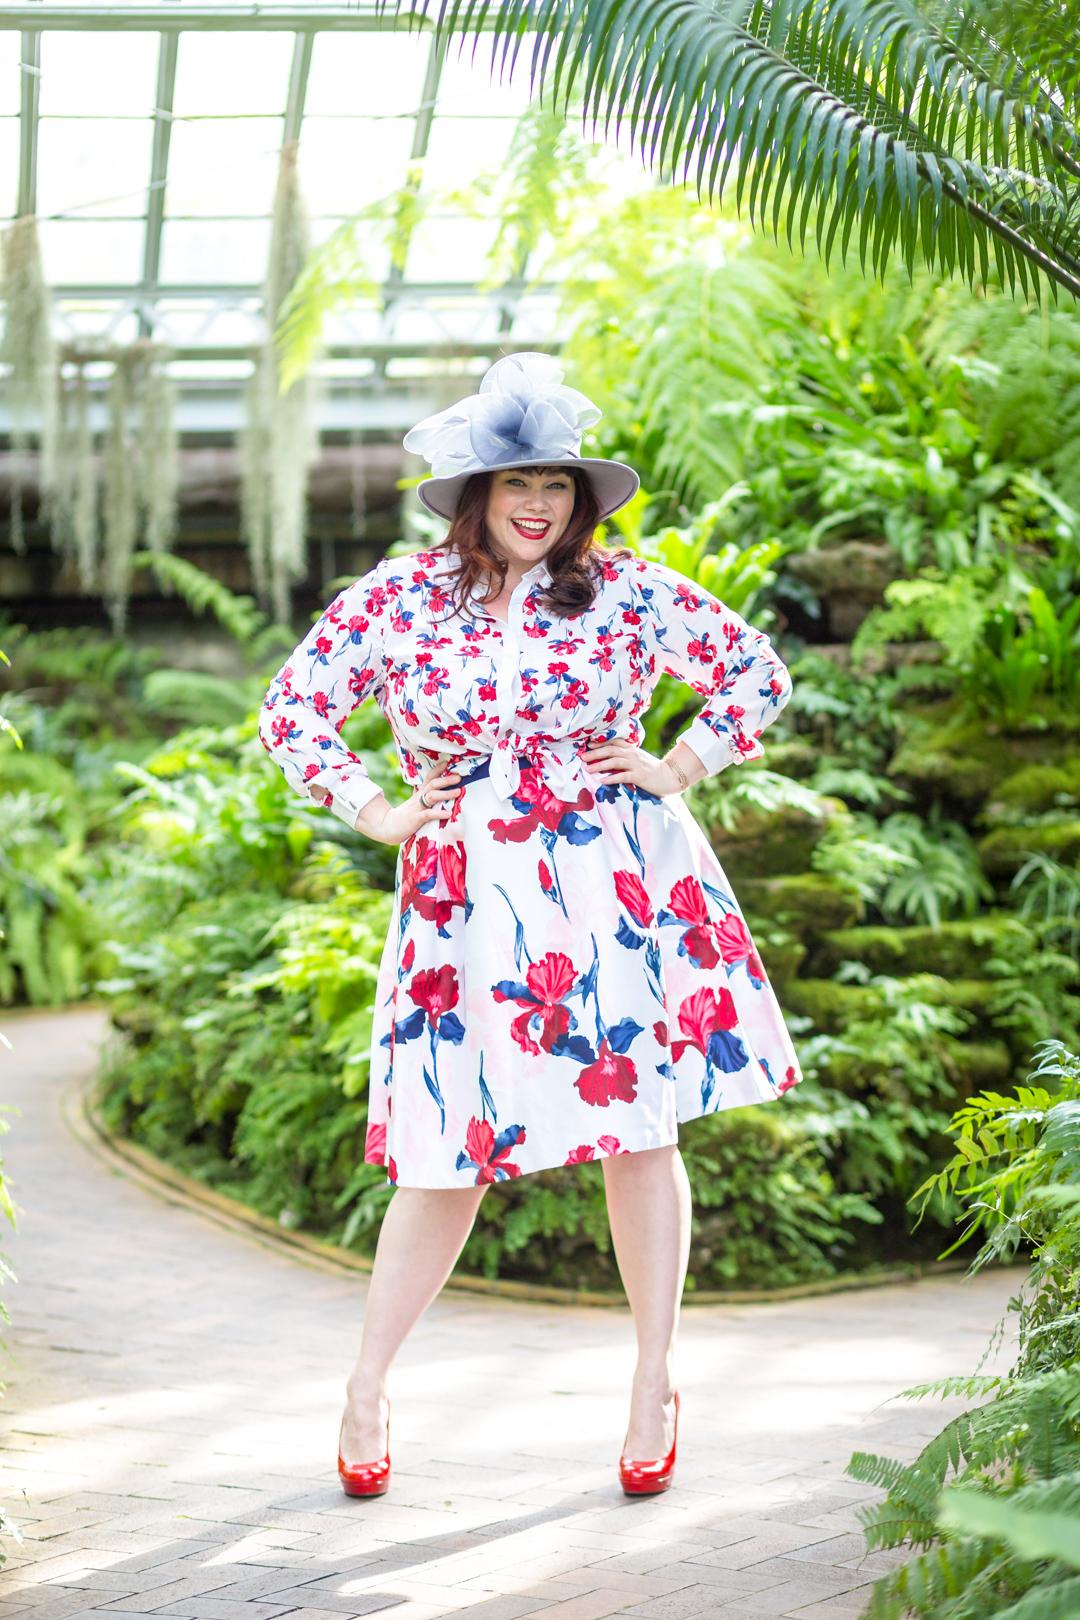 Prabal Gurung x Lane Bryant Floral Blouse and Floral Circle Skirt